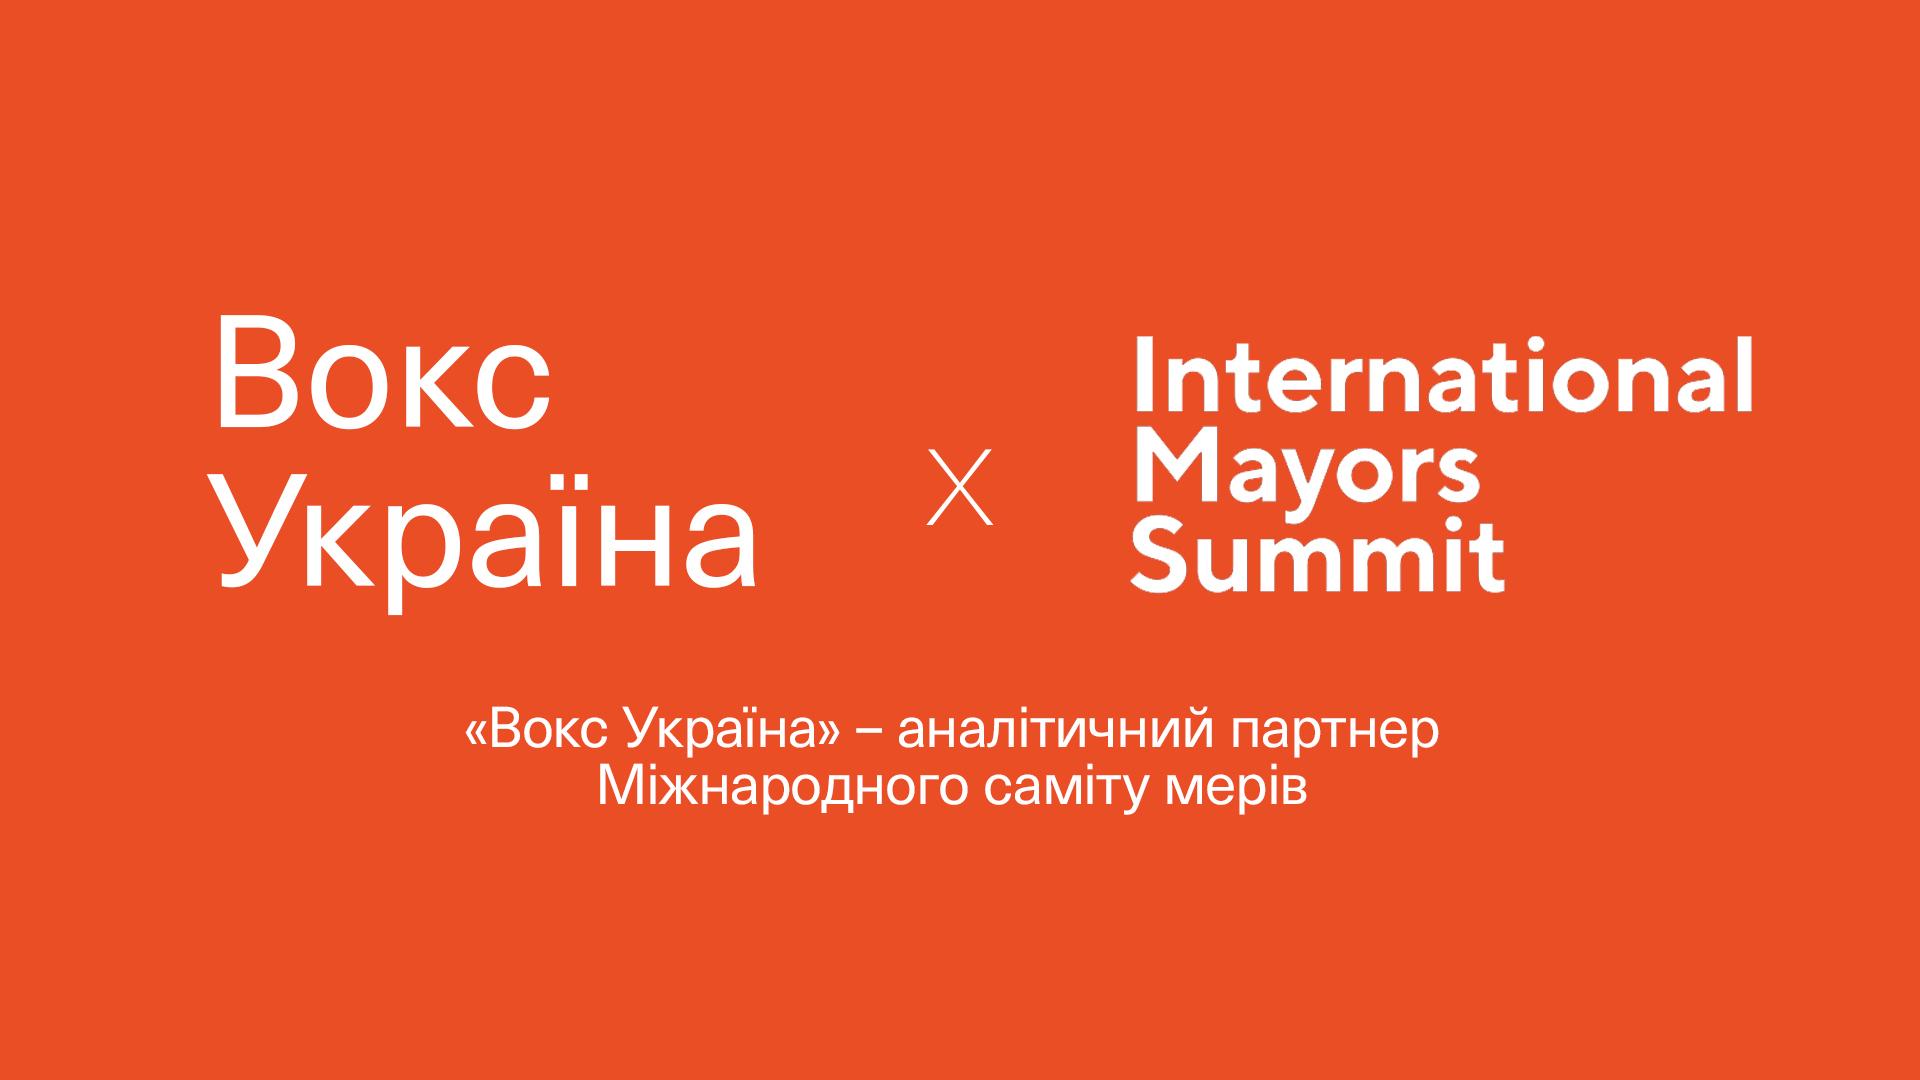 «Вокс Україна» — партнер Міжнародного саміту мерів